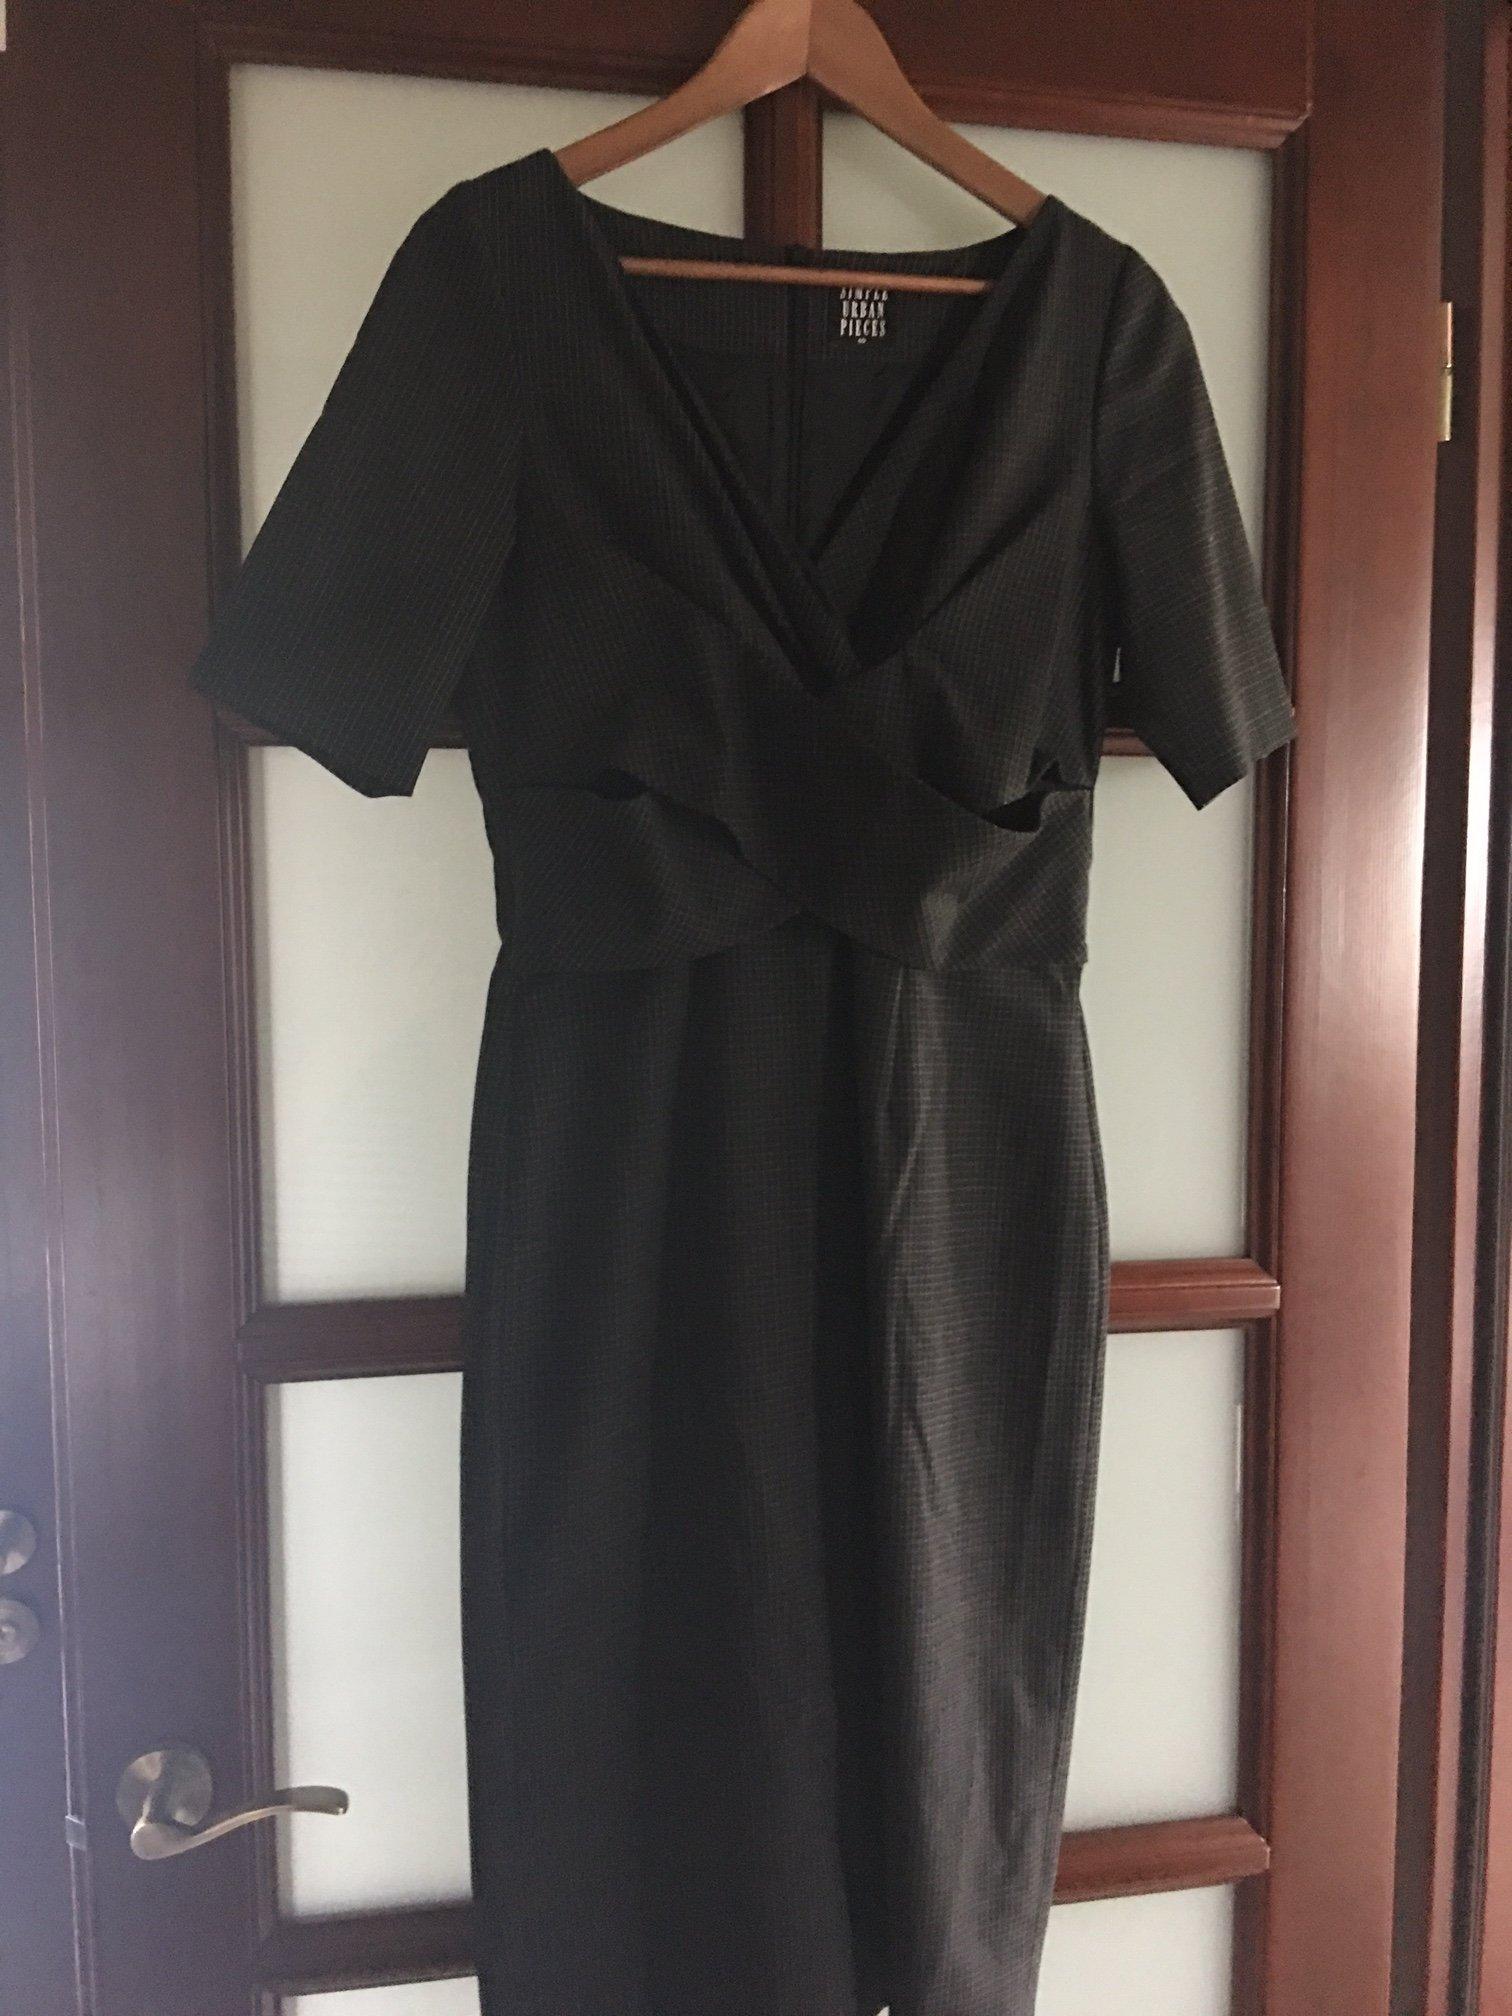 5f2f8a2536 Piękna sukienka SIMPLE 40 - 7088261095 - oficjalne archiwum allegro